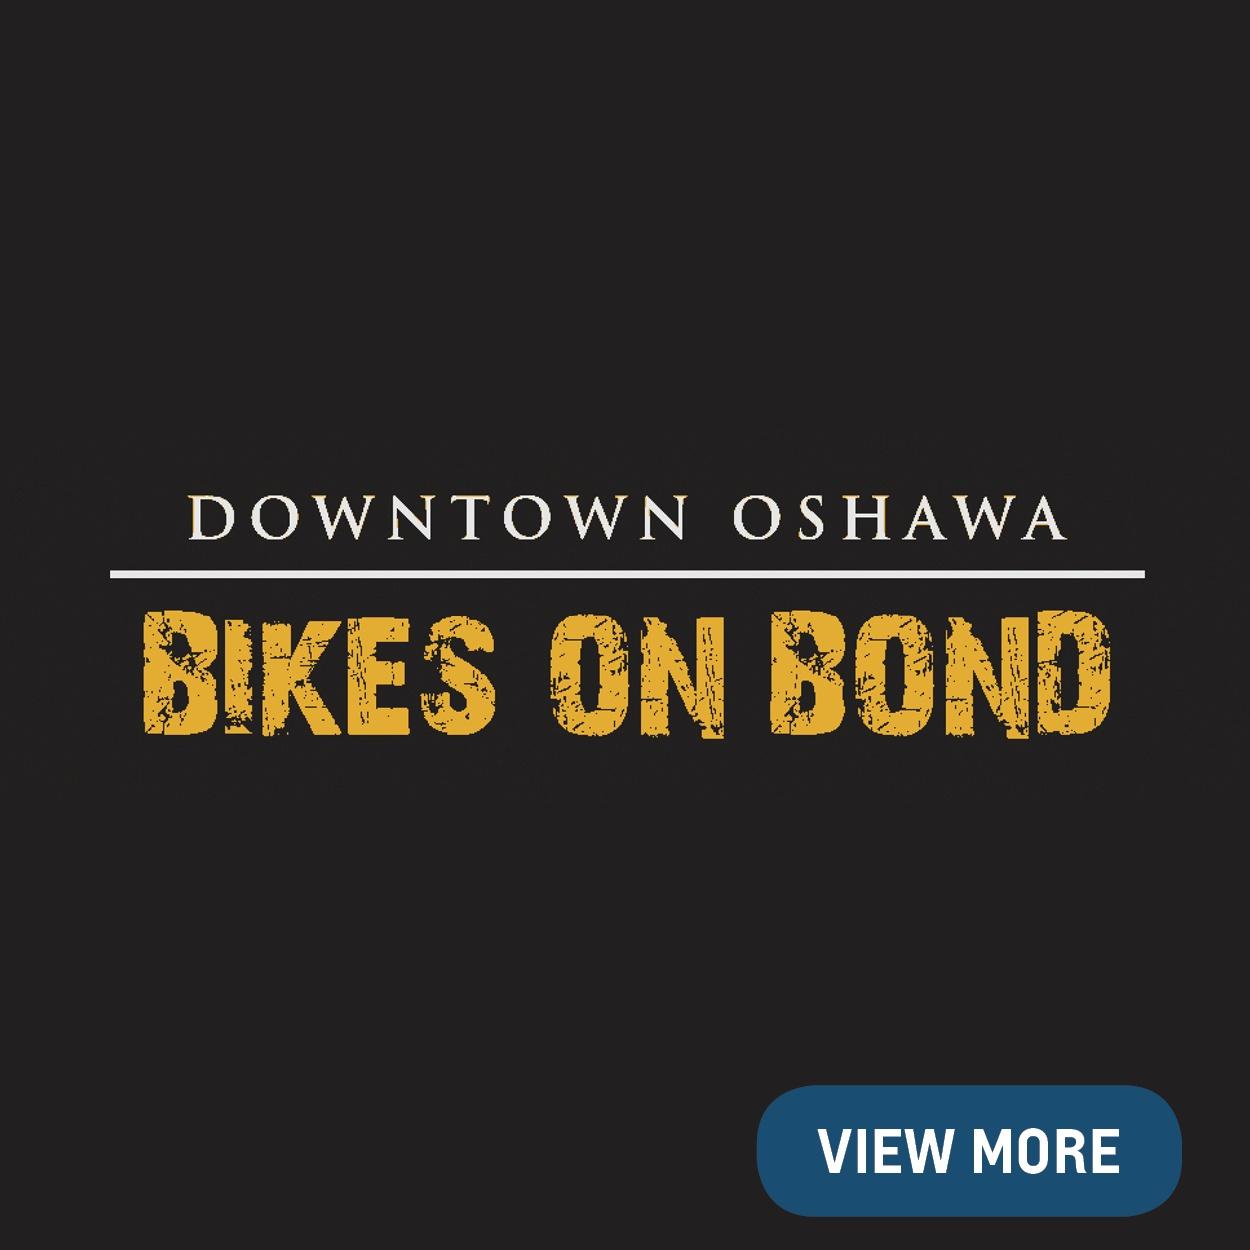 Bikes on Bond